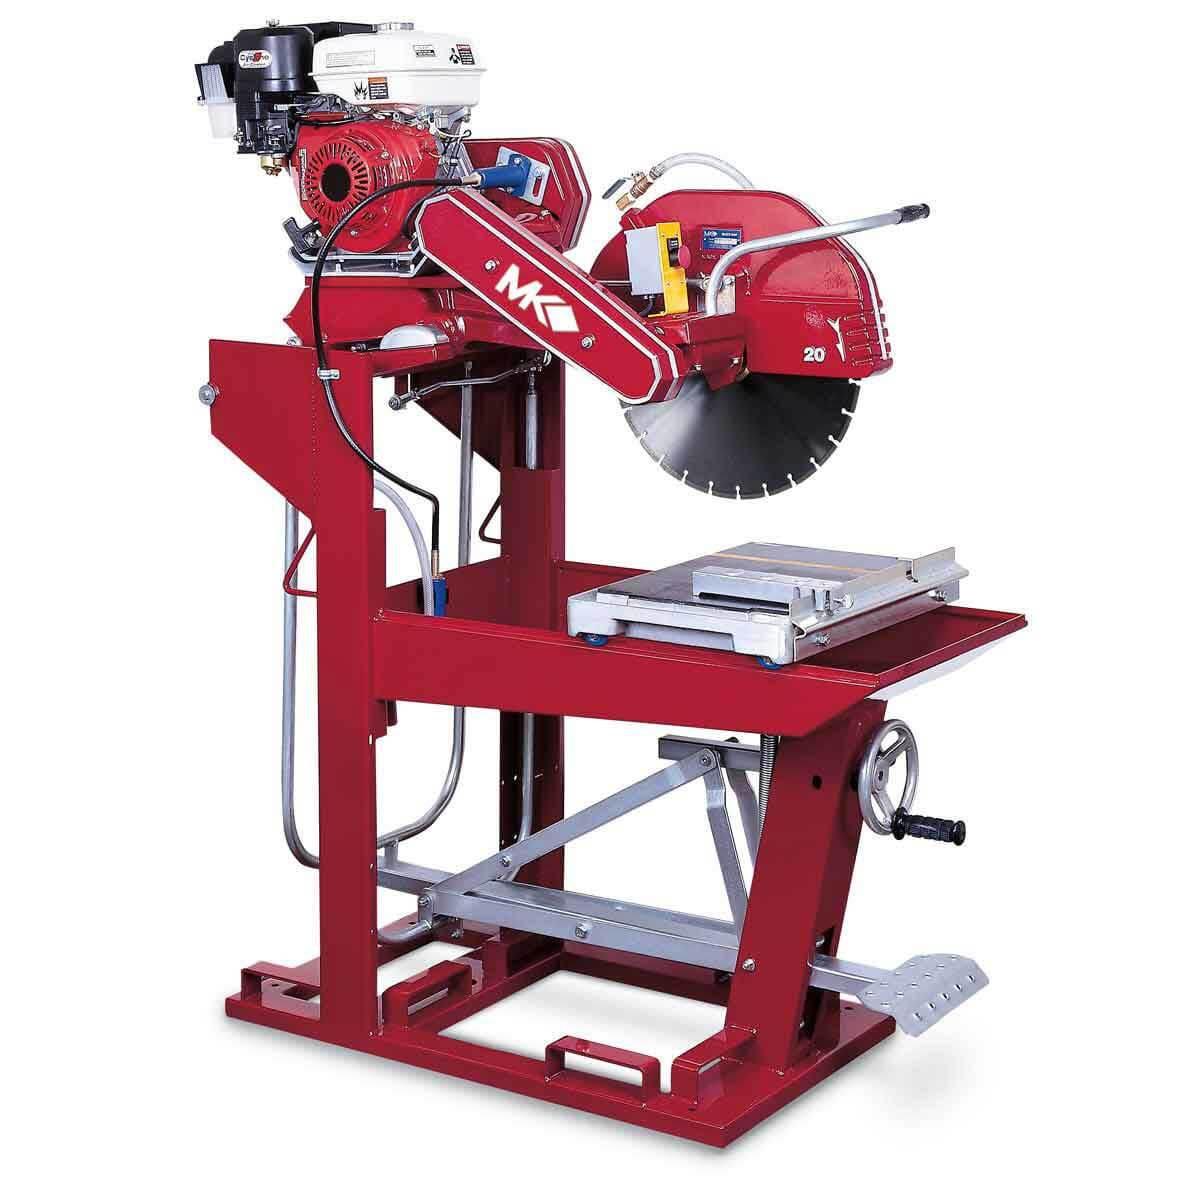 MK-5009G 20 inch Gas Series Block Saw